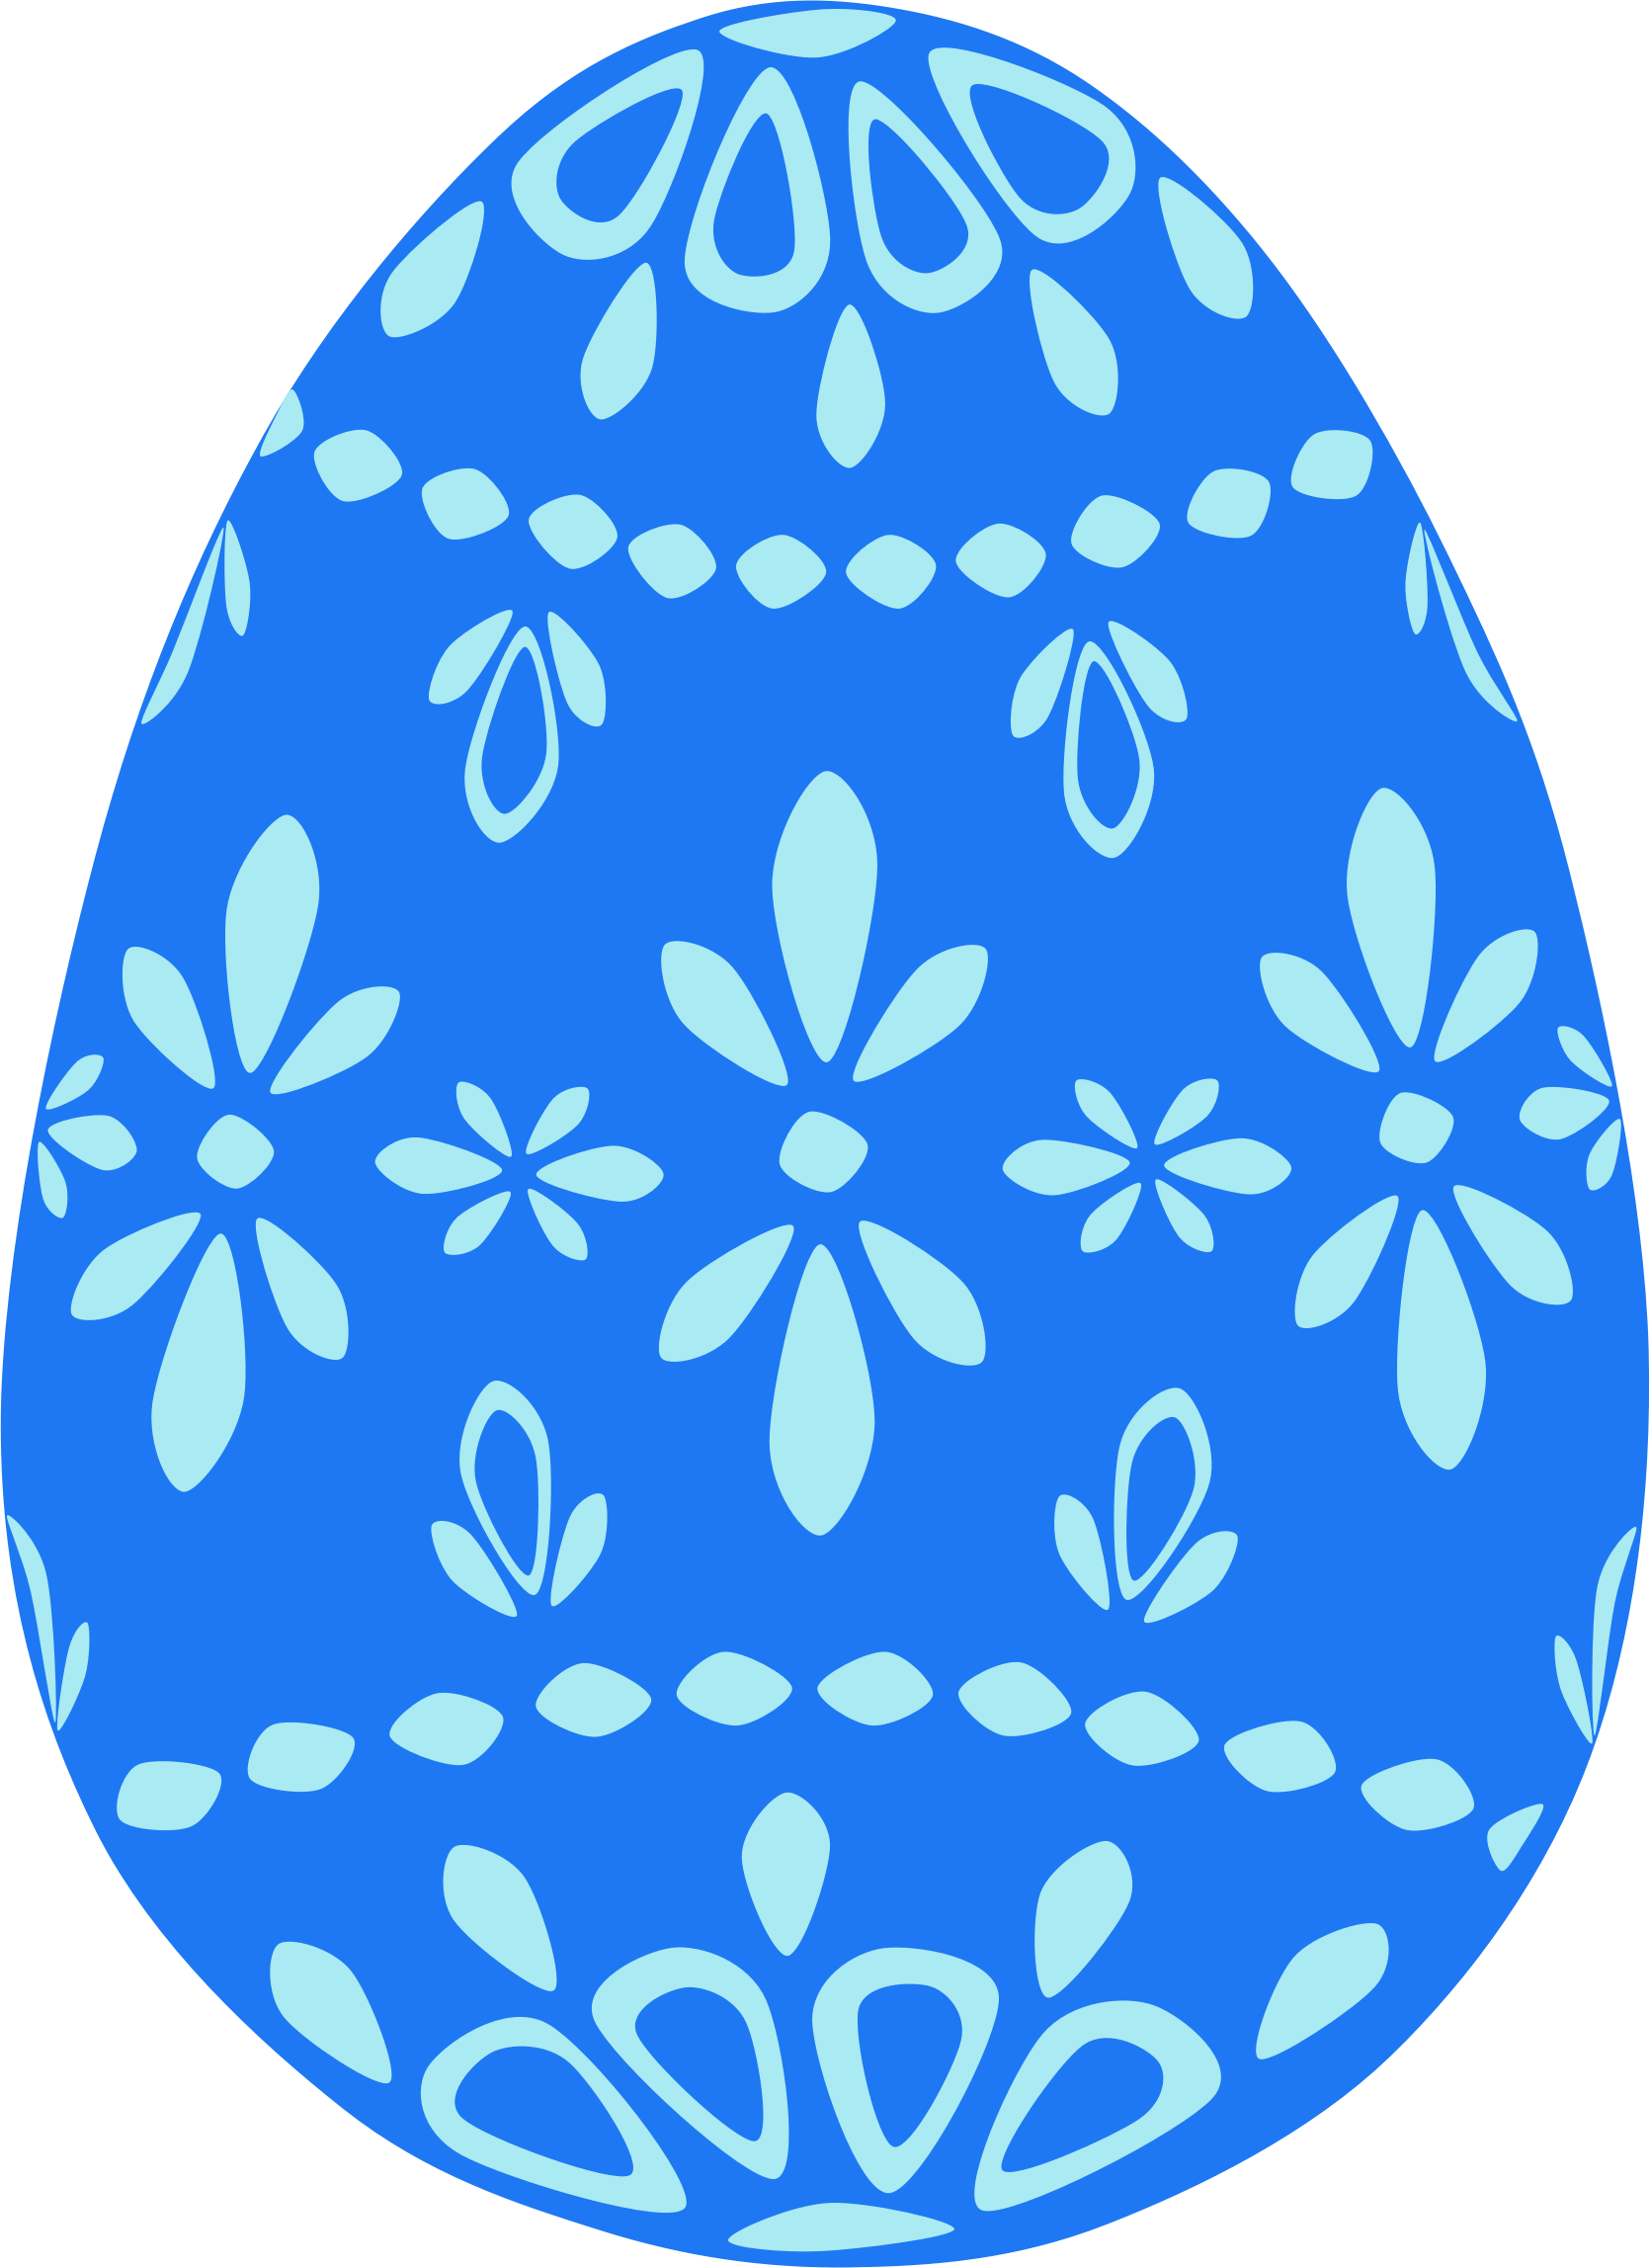 Blue clipart easter egg. Lace big image png